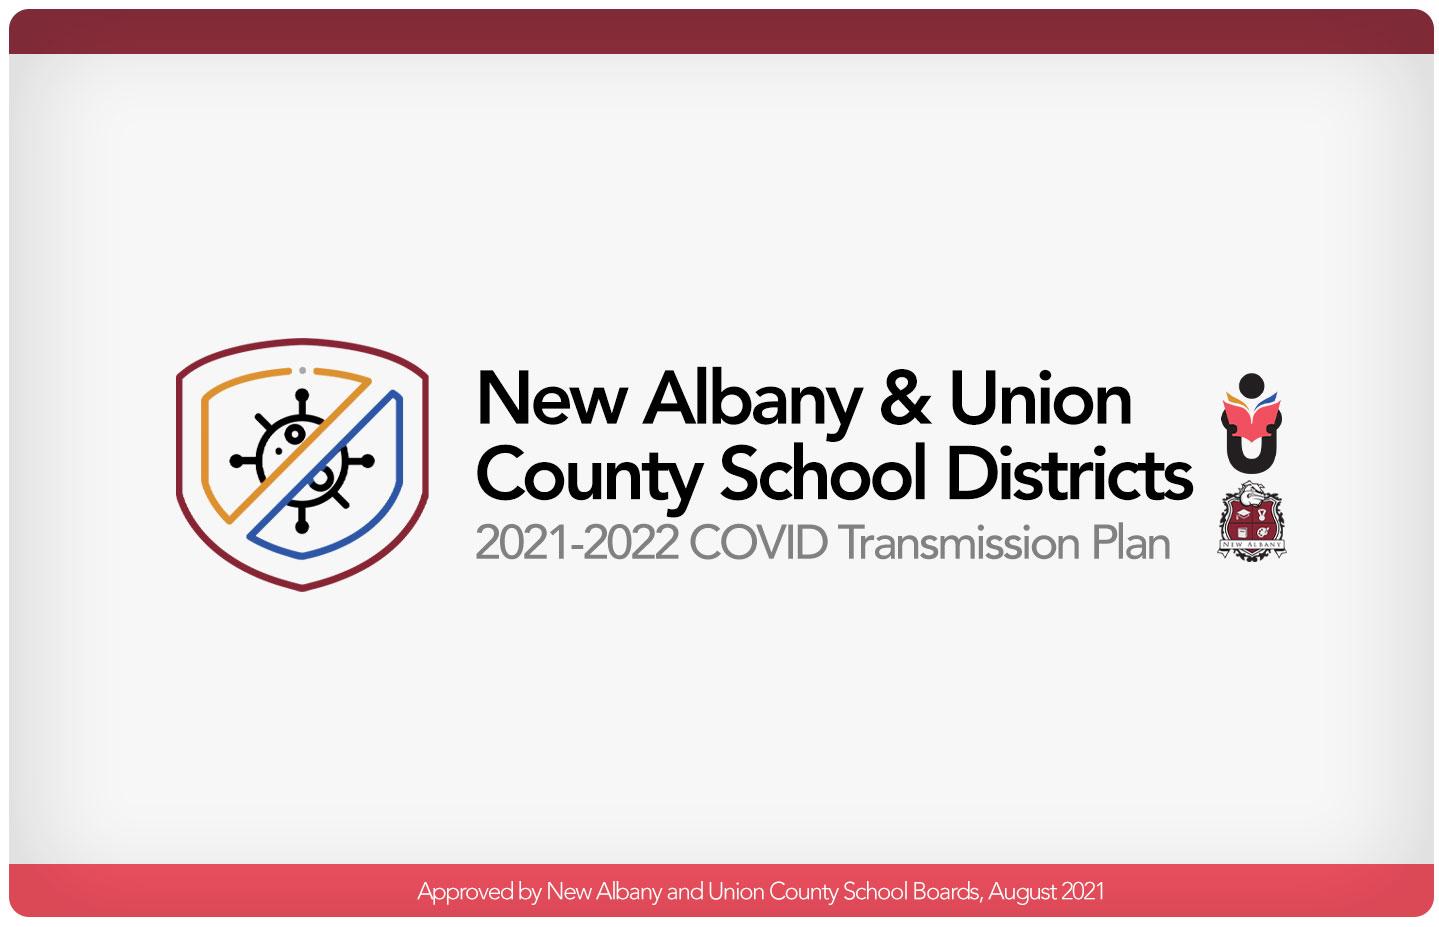 Covid Transmission Plan